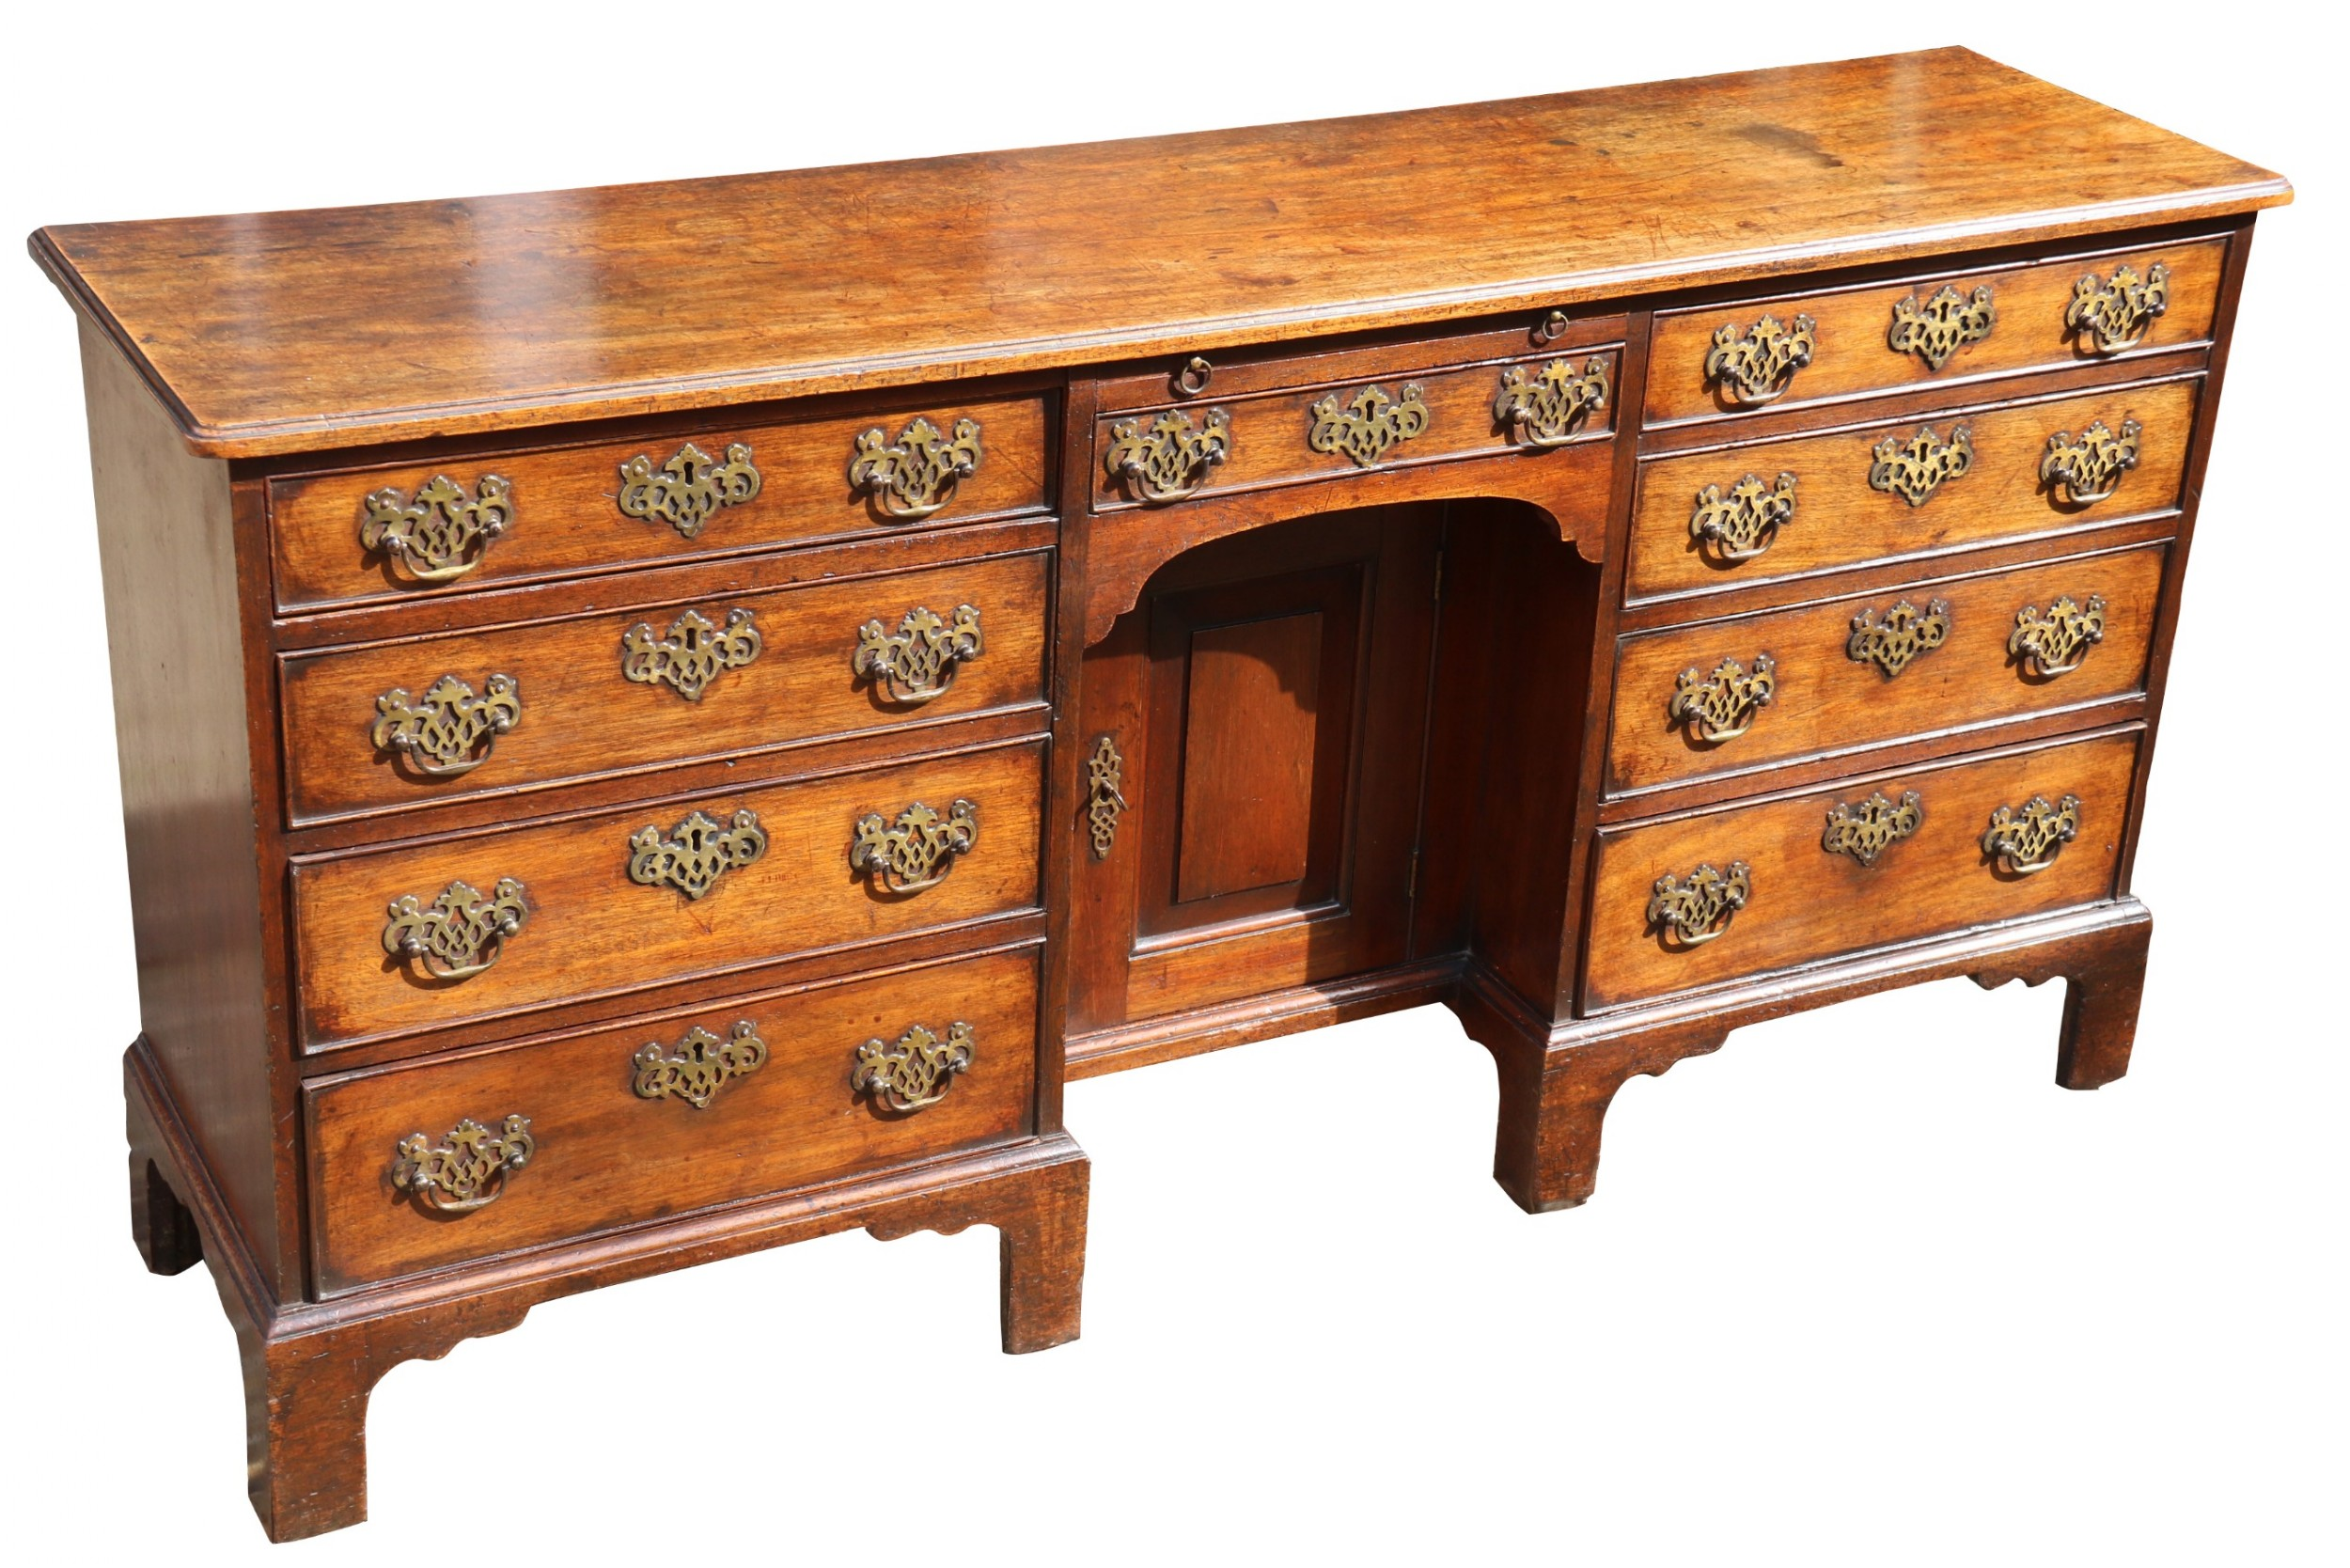 a rare irish 18th century mahogany library cabinet of very small proportions